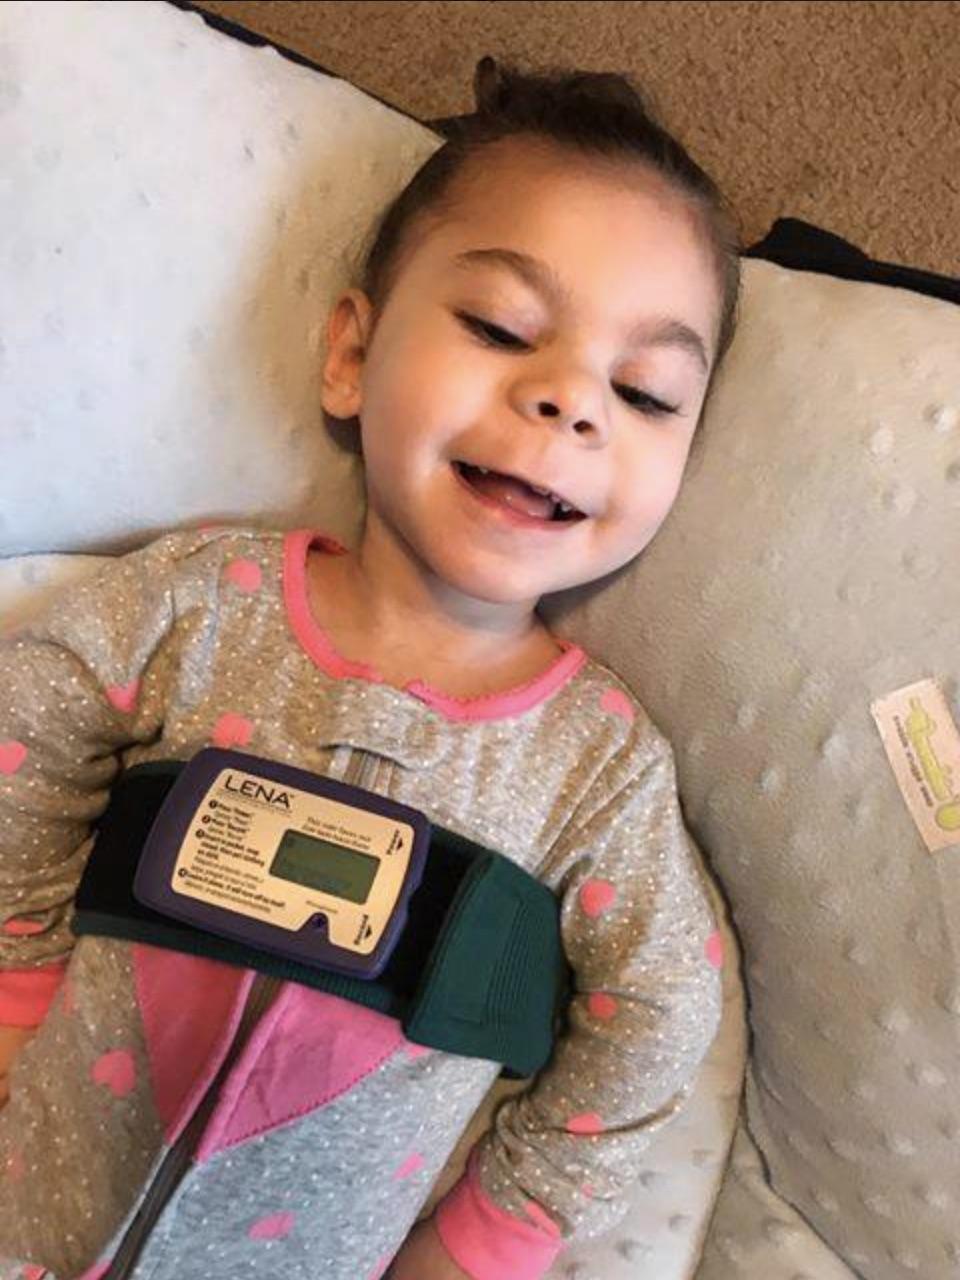 Makenna Loyd, wearing the LENA audio recording device.